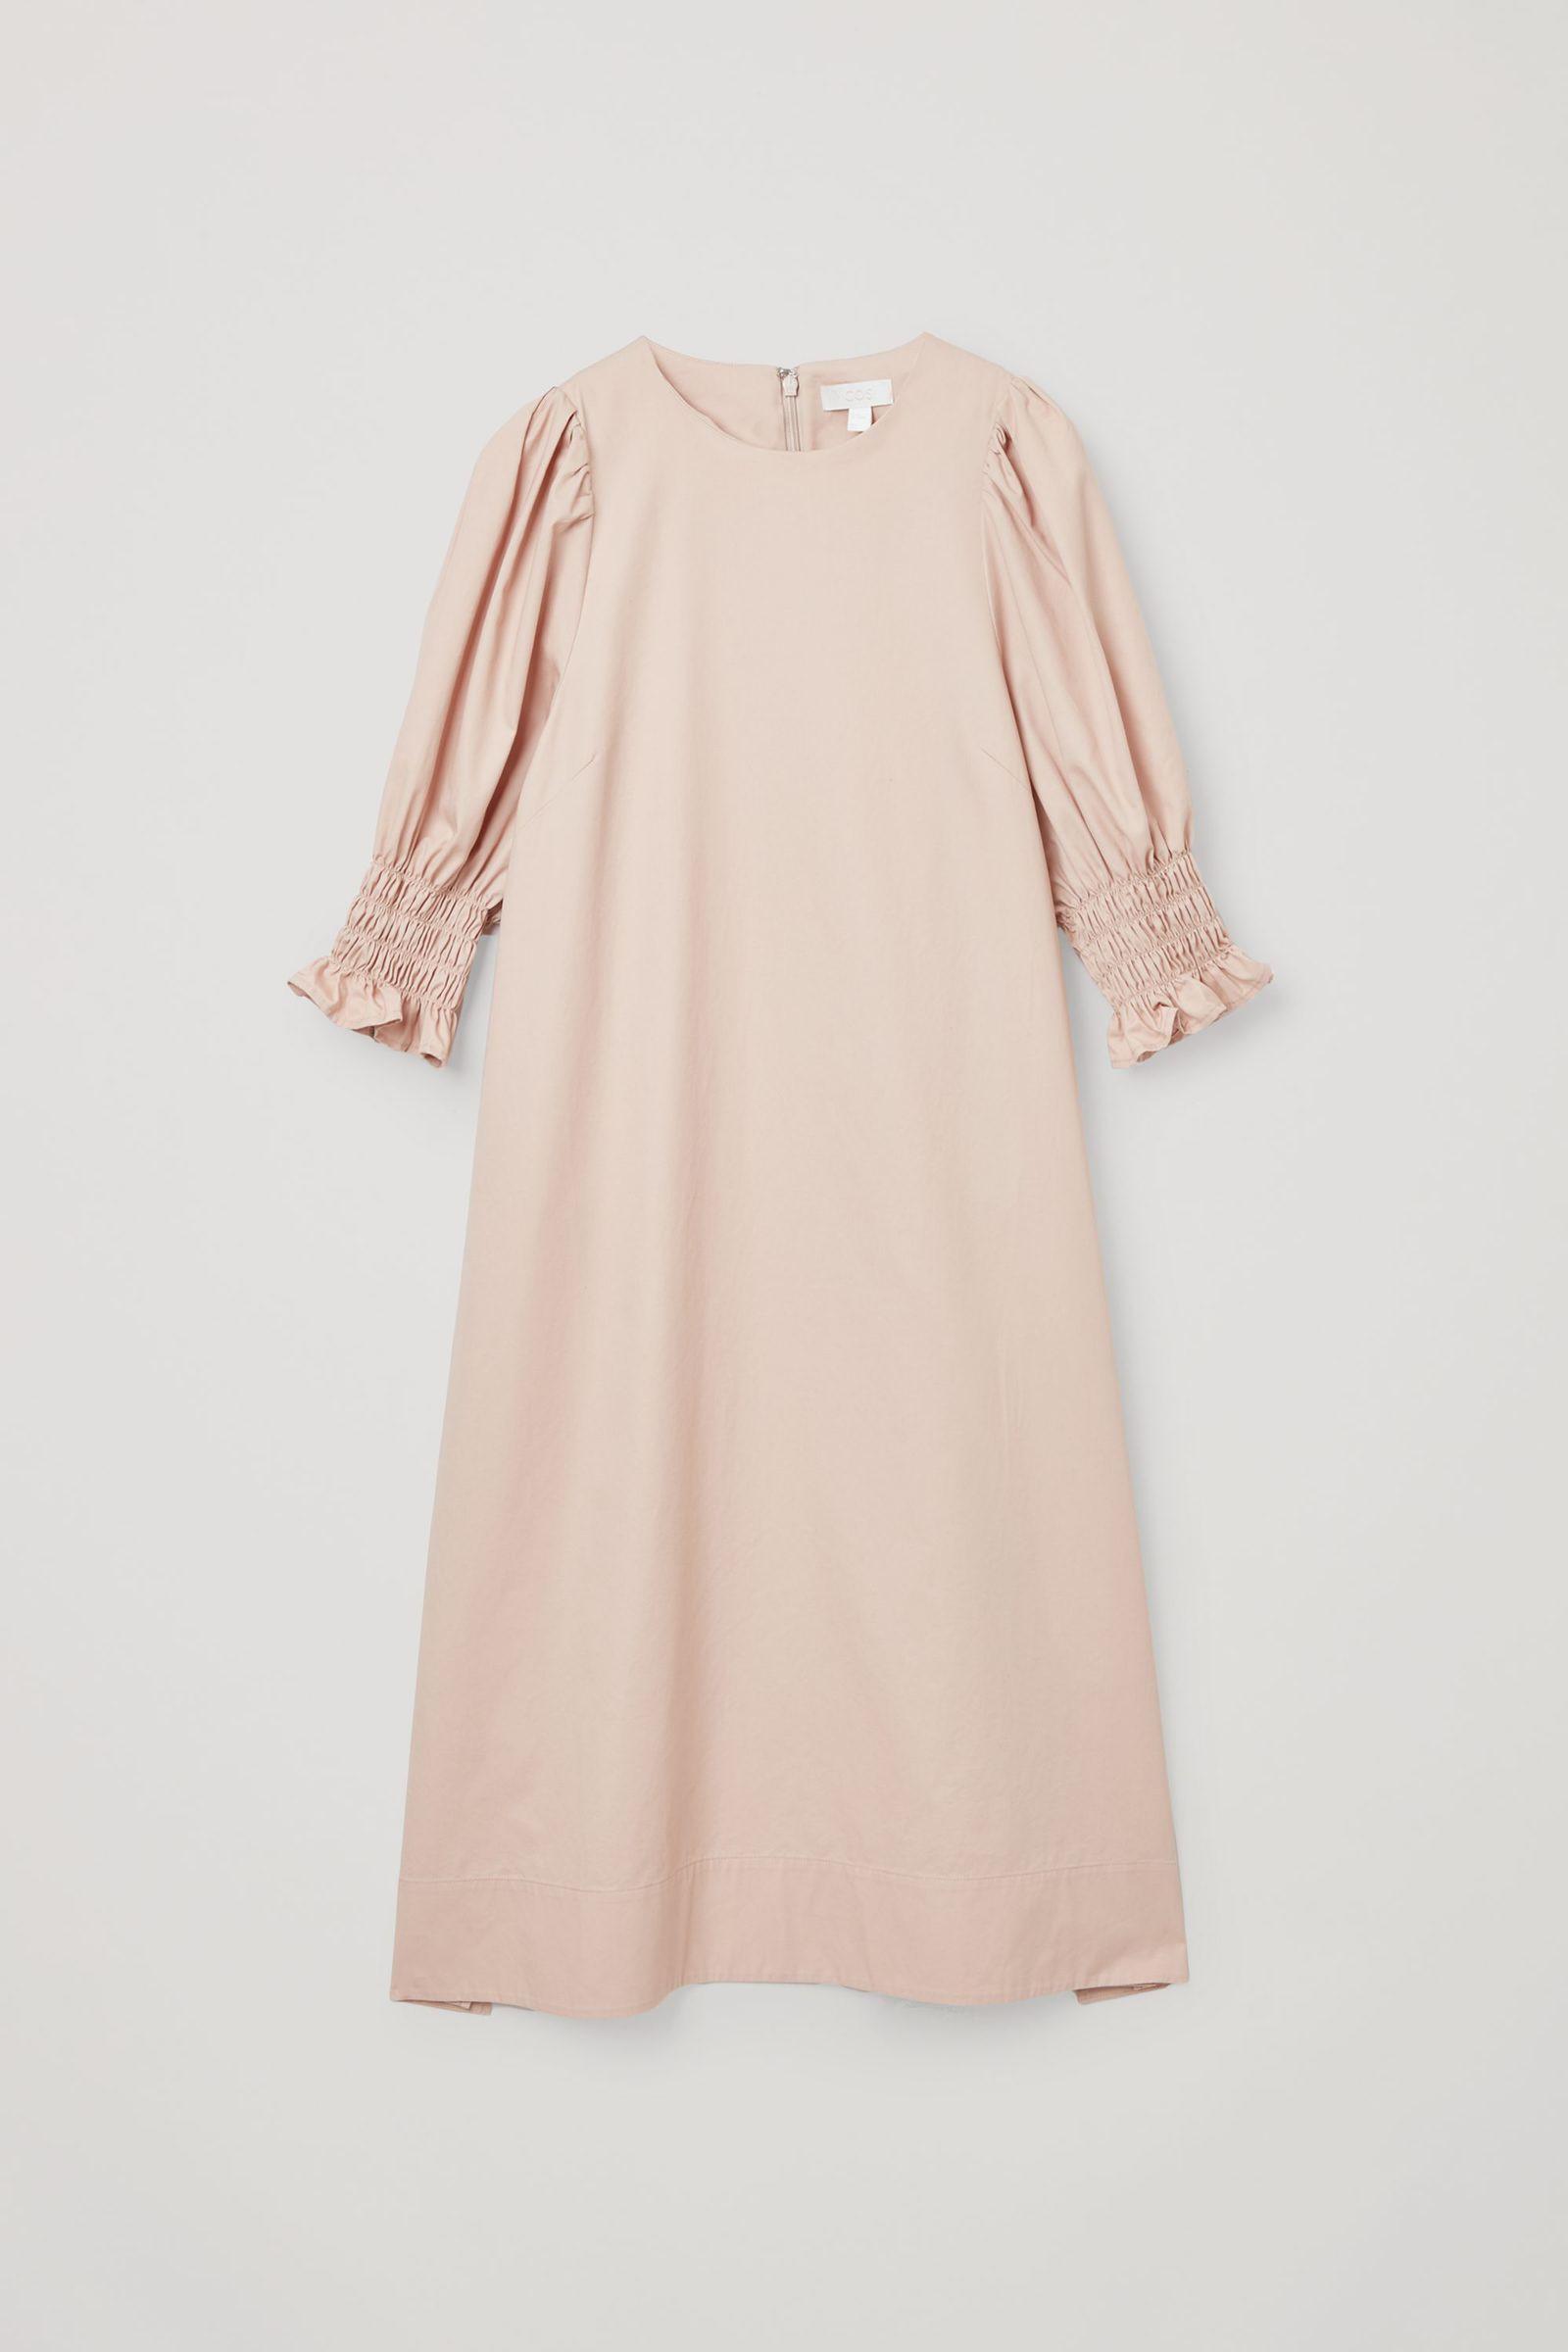 COS 코튼 스모킹 퍼프 슬리브 드레스의 베이지컬러 Product입니다.